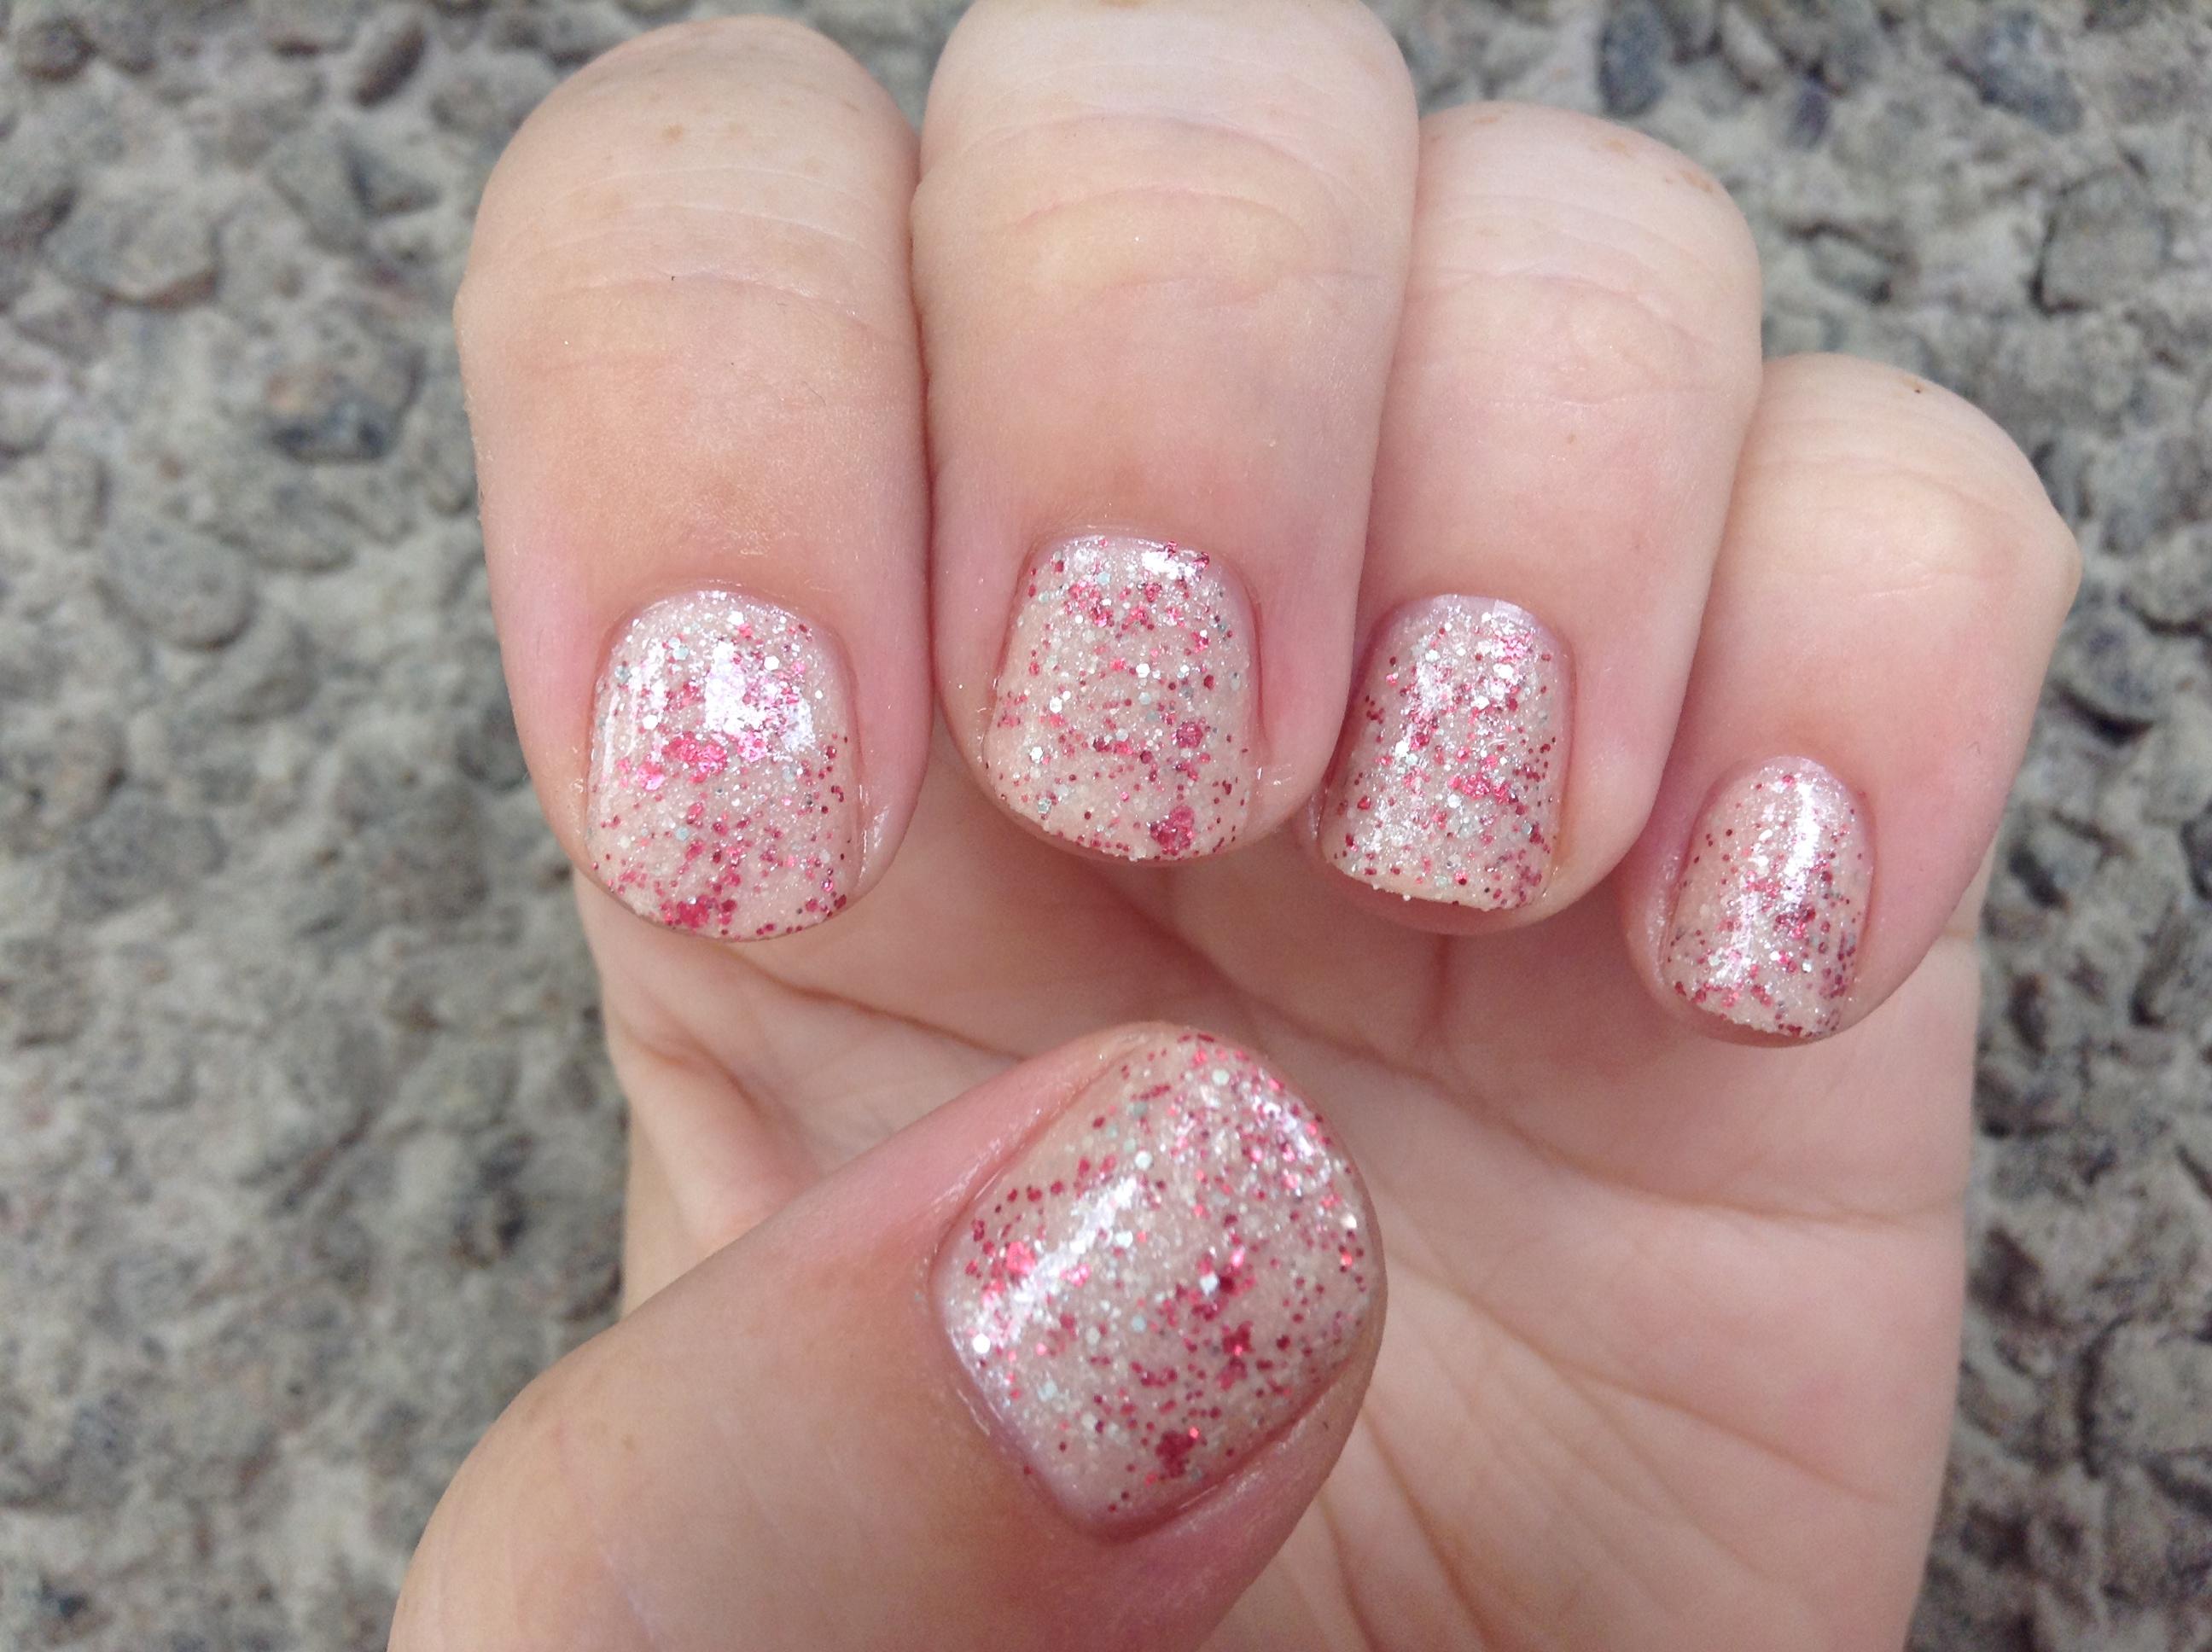 Cinnaburst Finger Candy